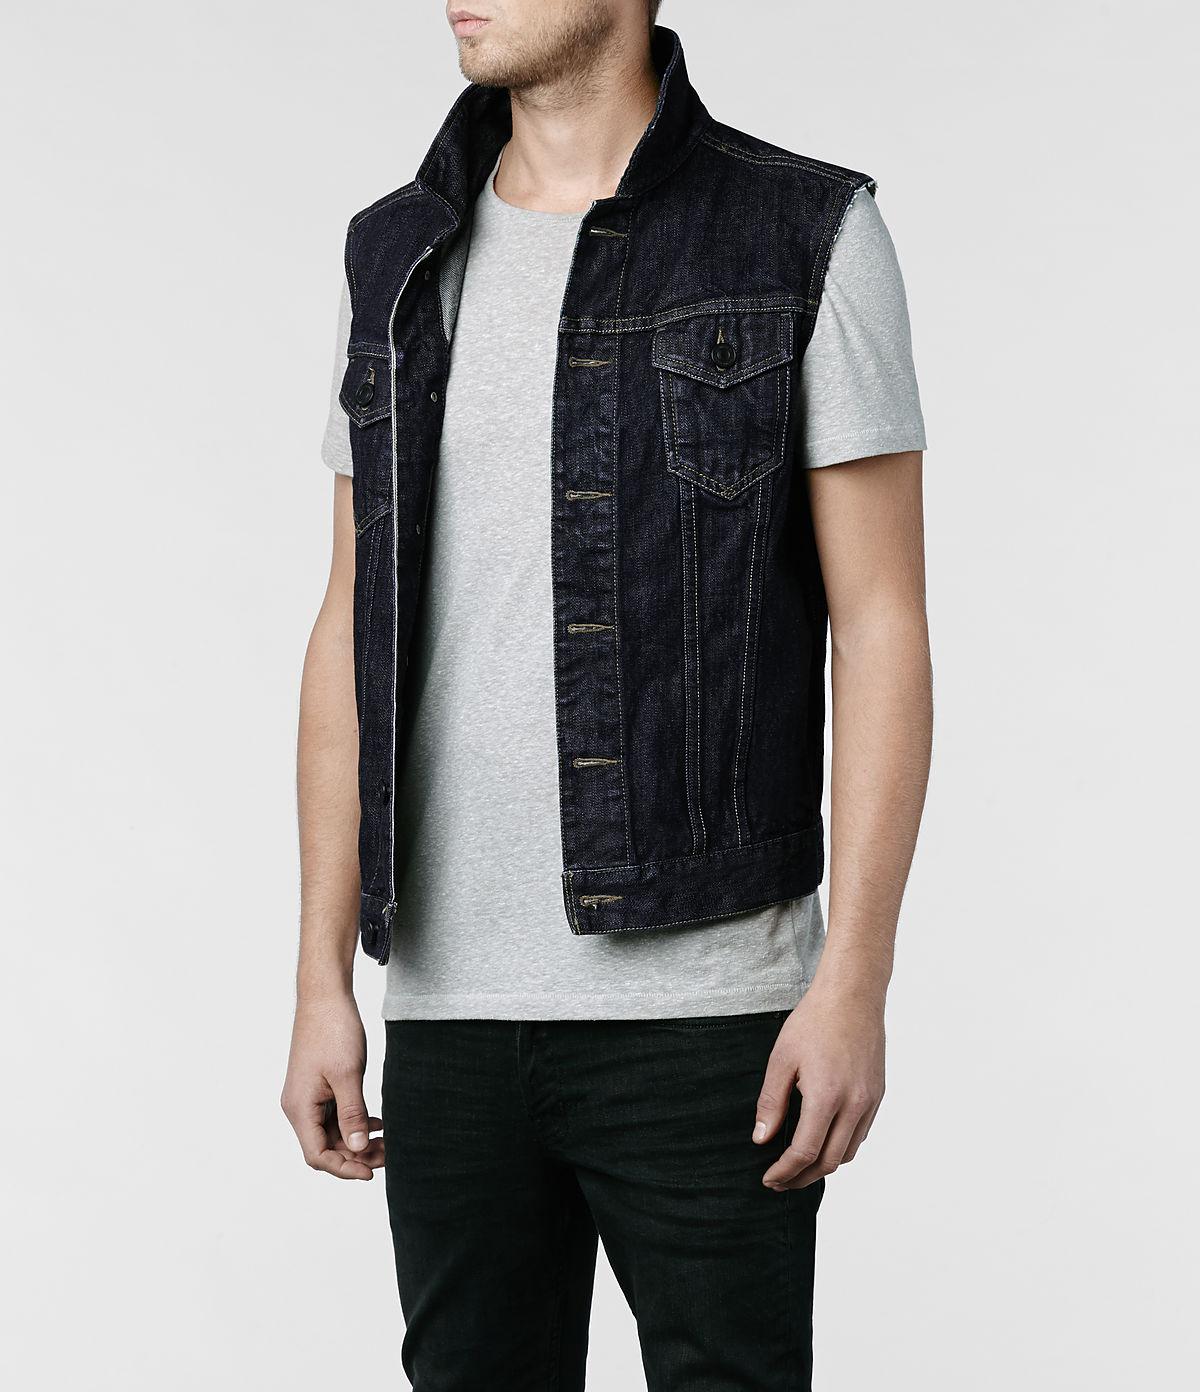 AllSaints Iwate Sleeveless Denim Jacket in Indigo (Blue) for Men